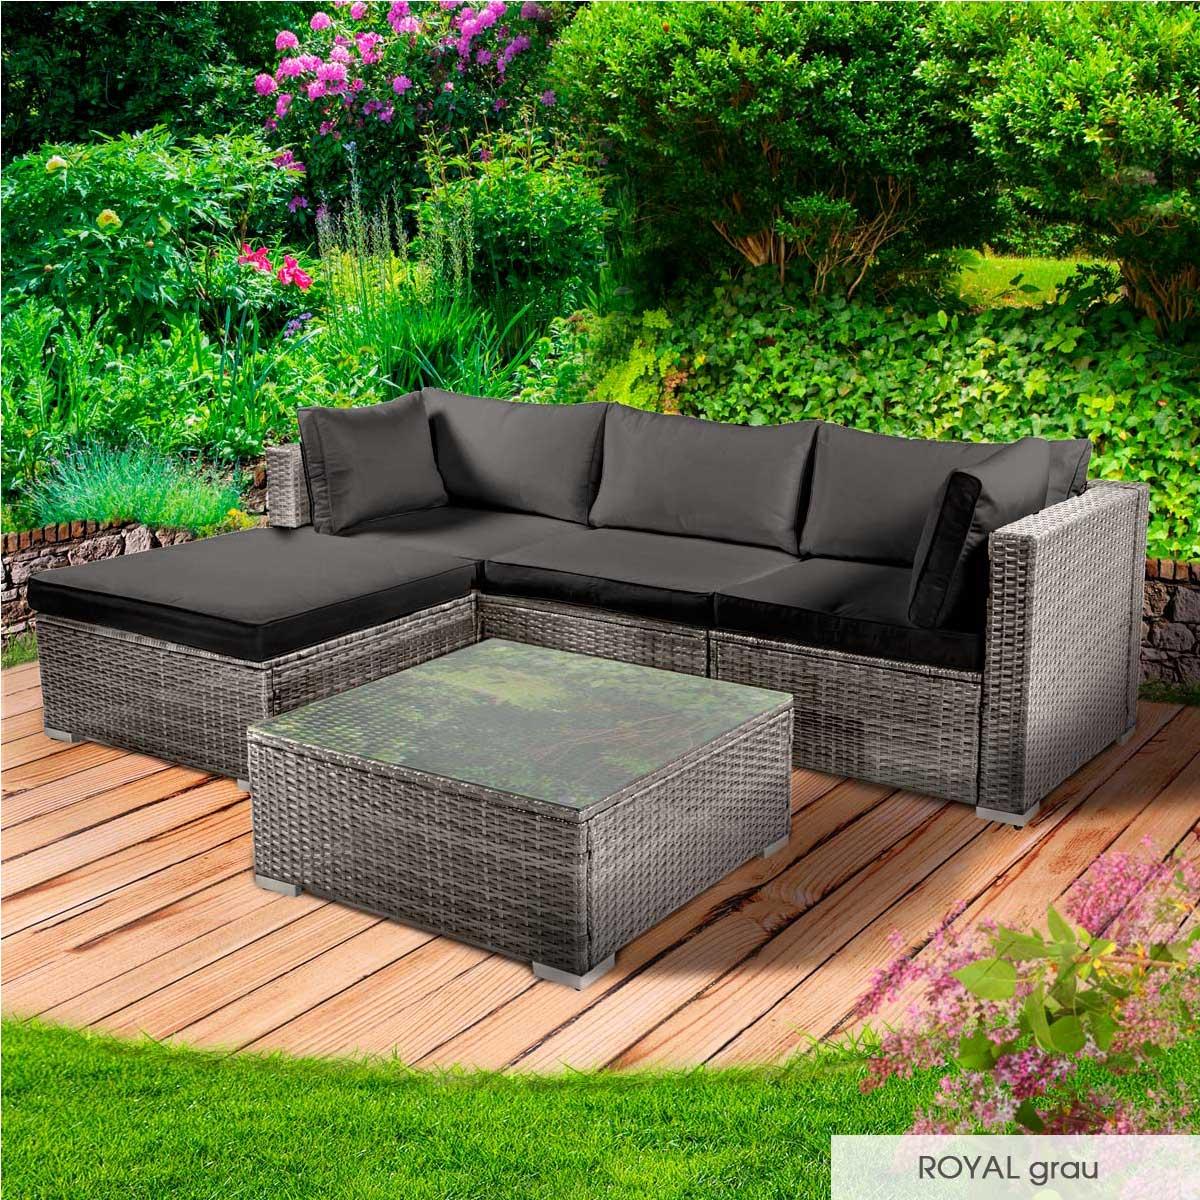 Gartenmoebel-Poly-Rattan-Lounge-Moebel-Sitzgarnitur-Gartengarnitur-Sitzgruppe-Sofa Indexbild 15